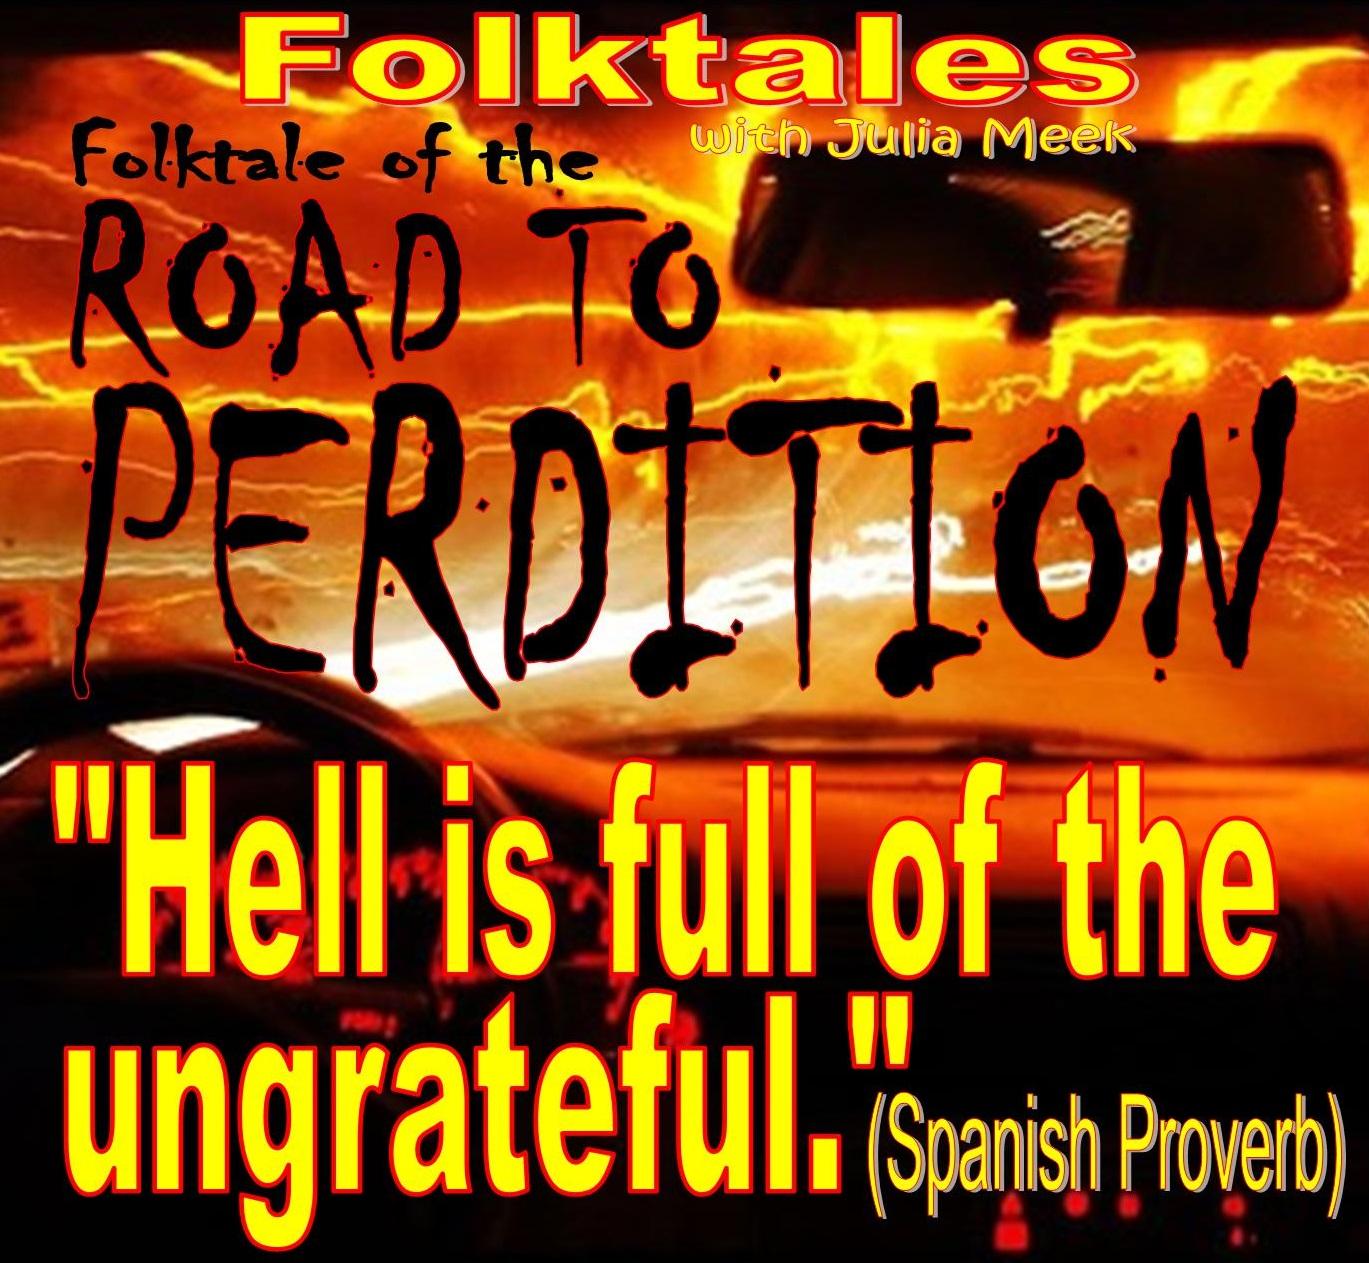 Caption: Folktale of The Road to Perdition, Credit: Julia Meek